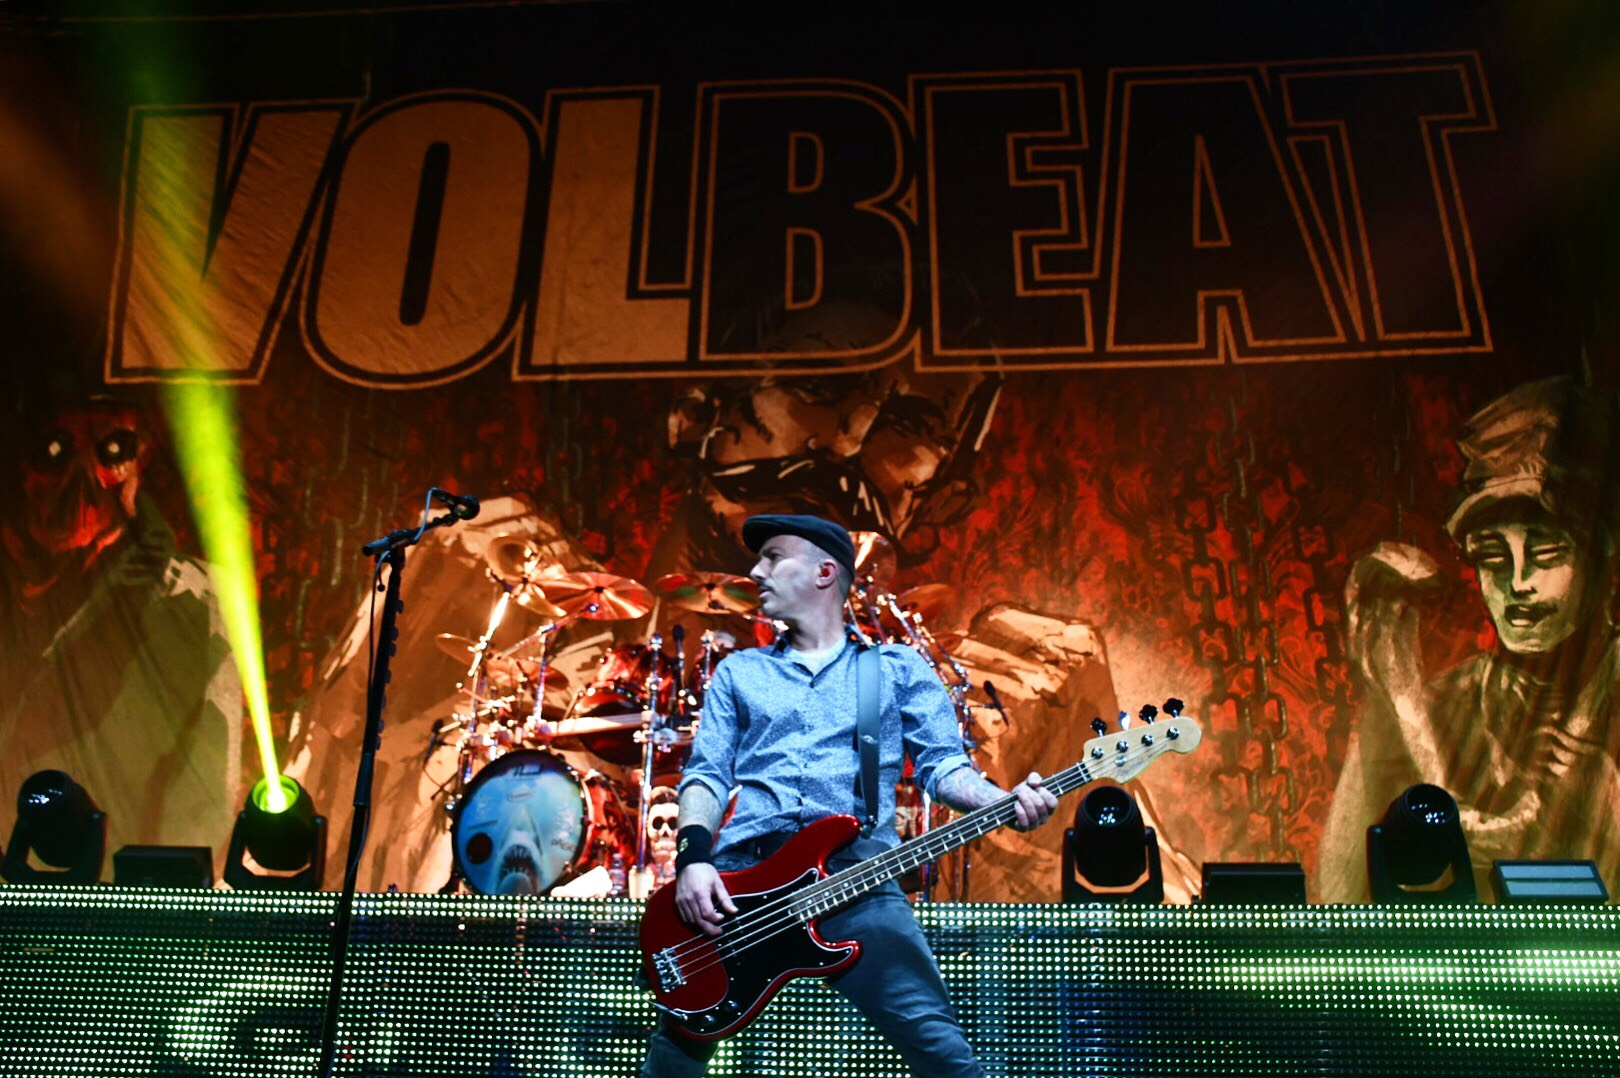 Behemoth, Gojira, Volbeat @ The Pepsi Center - Photos